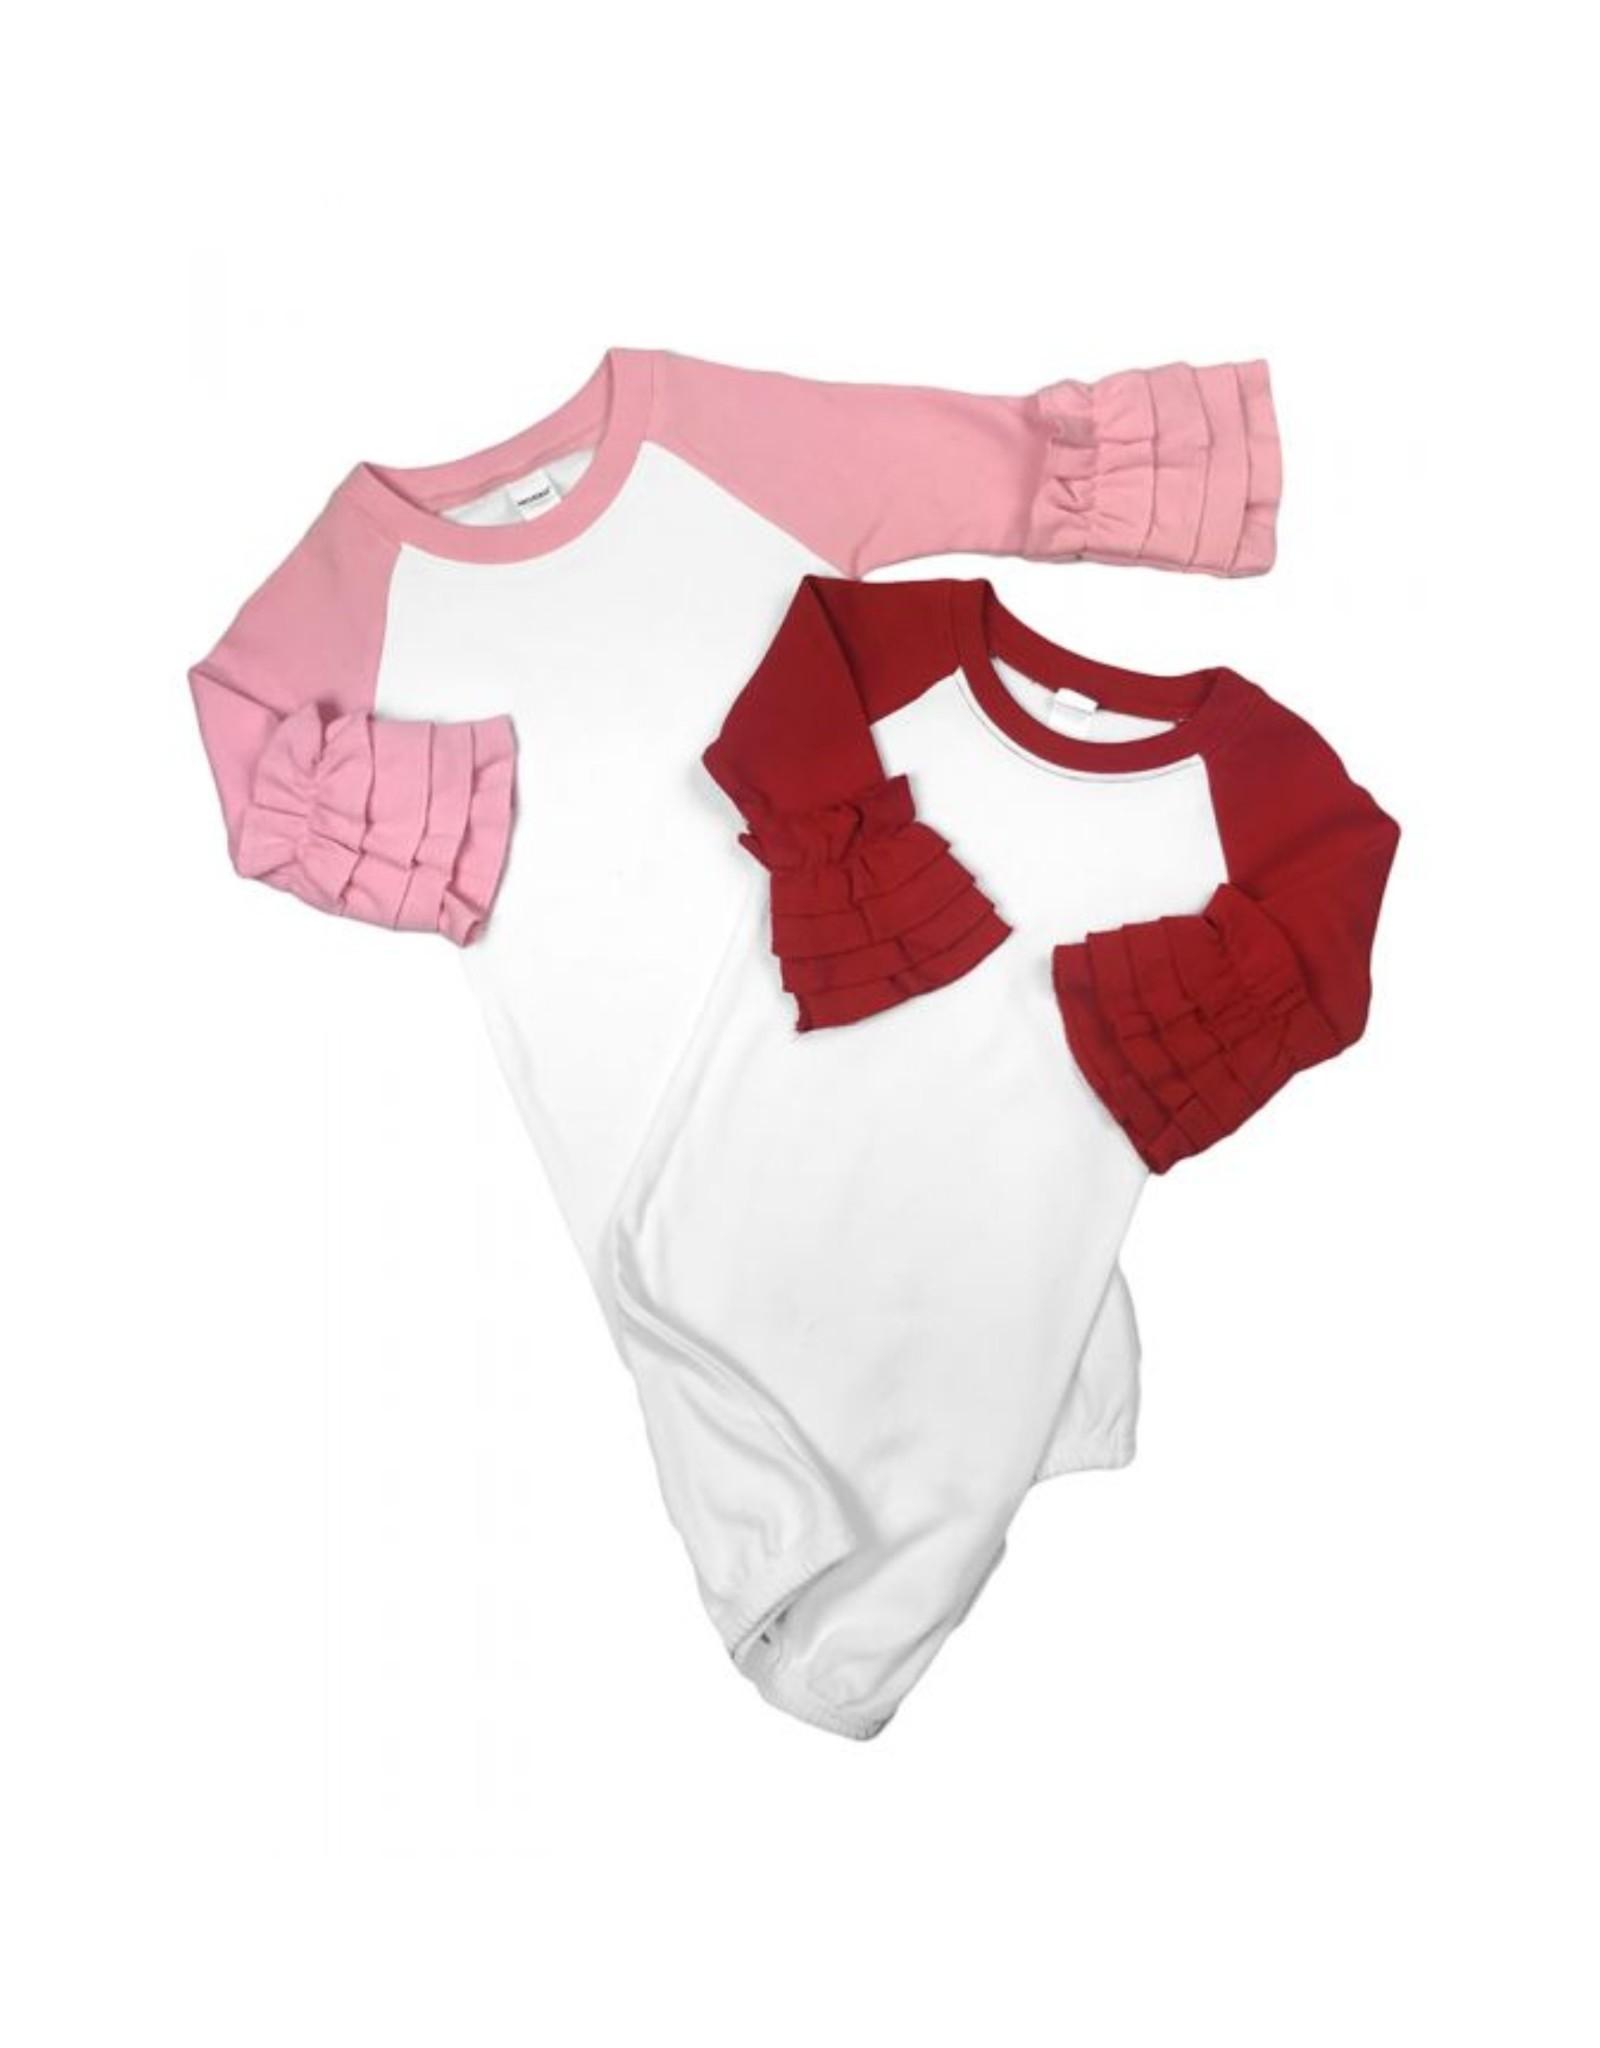 Monag Ruffle Raglan Baby Gown